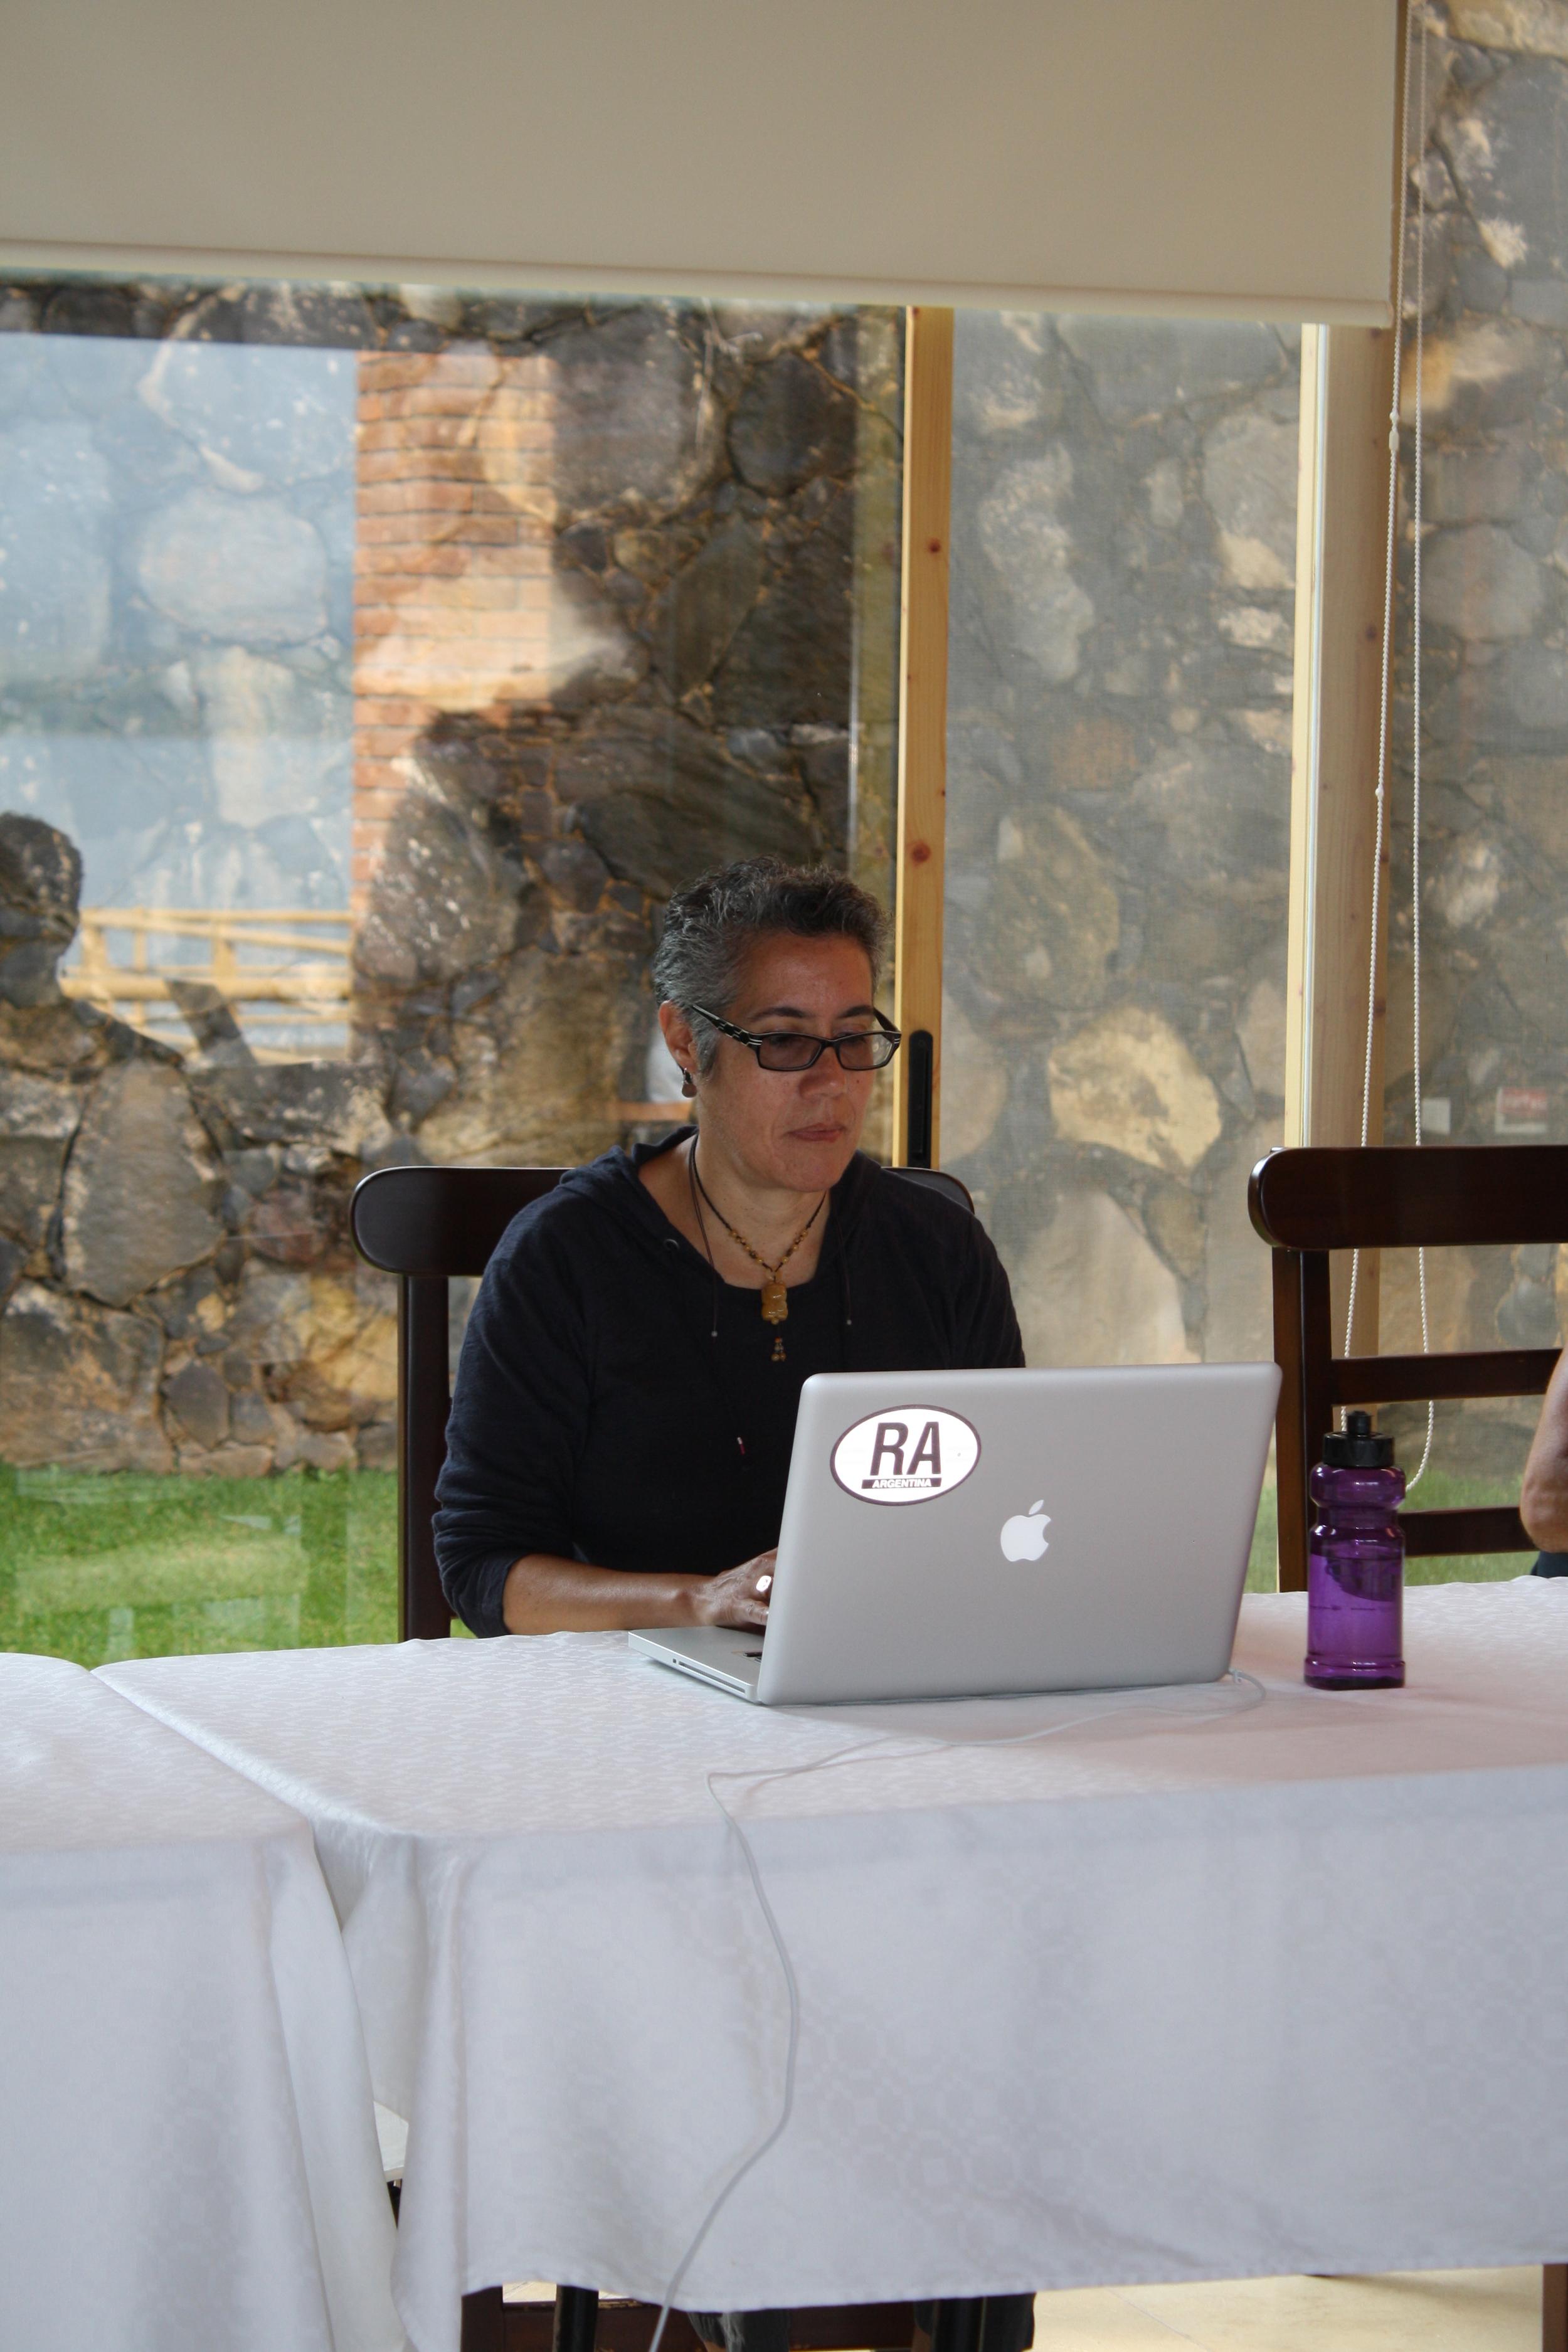 Working on script re-write at Cine Qua Non Lab Writer's Residency in Morelia, México.